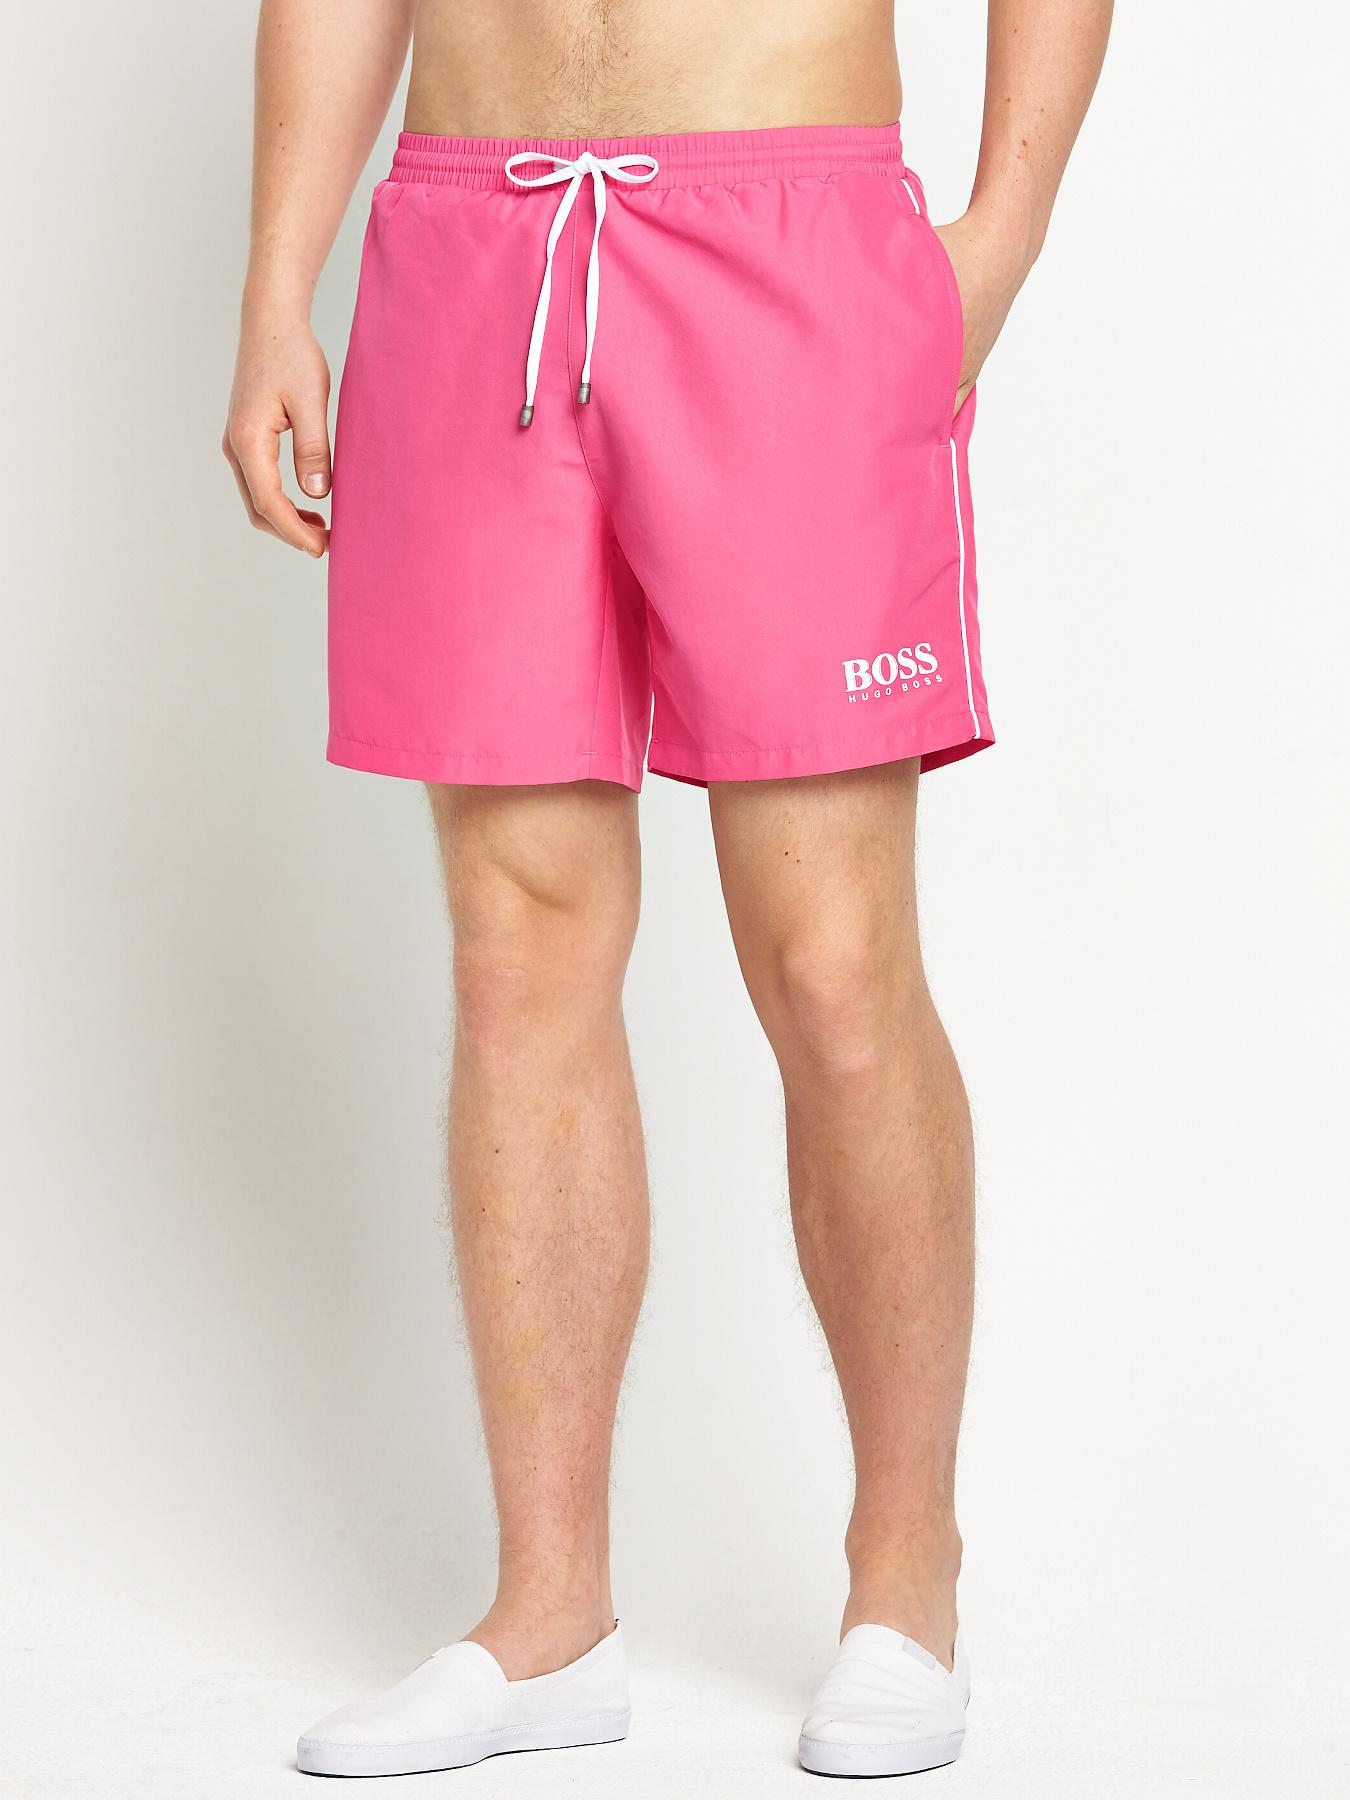 Hugo Boss Mens Starfish Swim Shorts - Pink - Pink, Pink